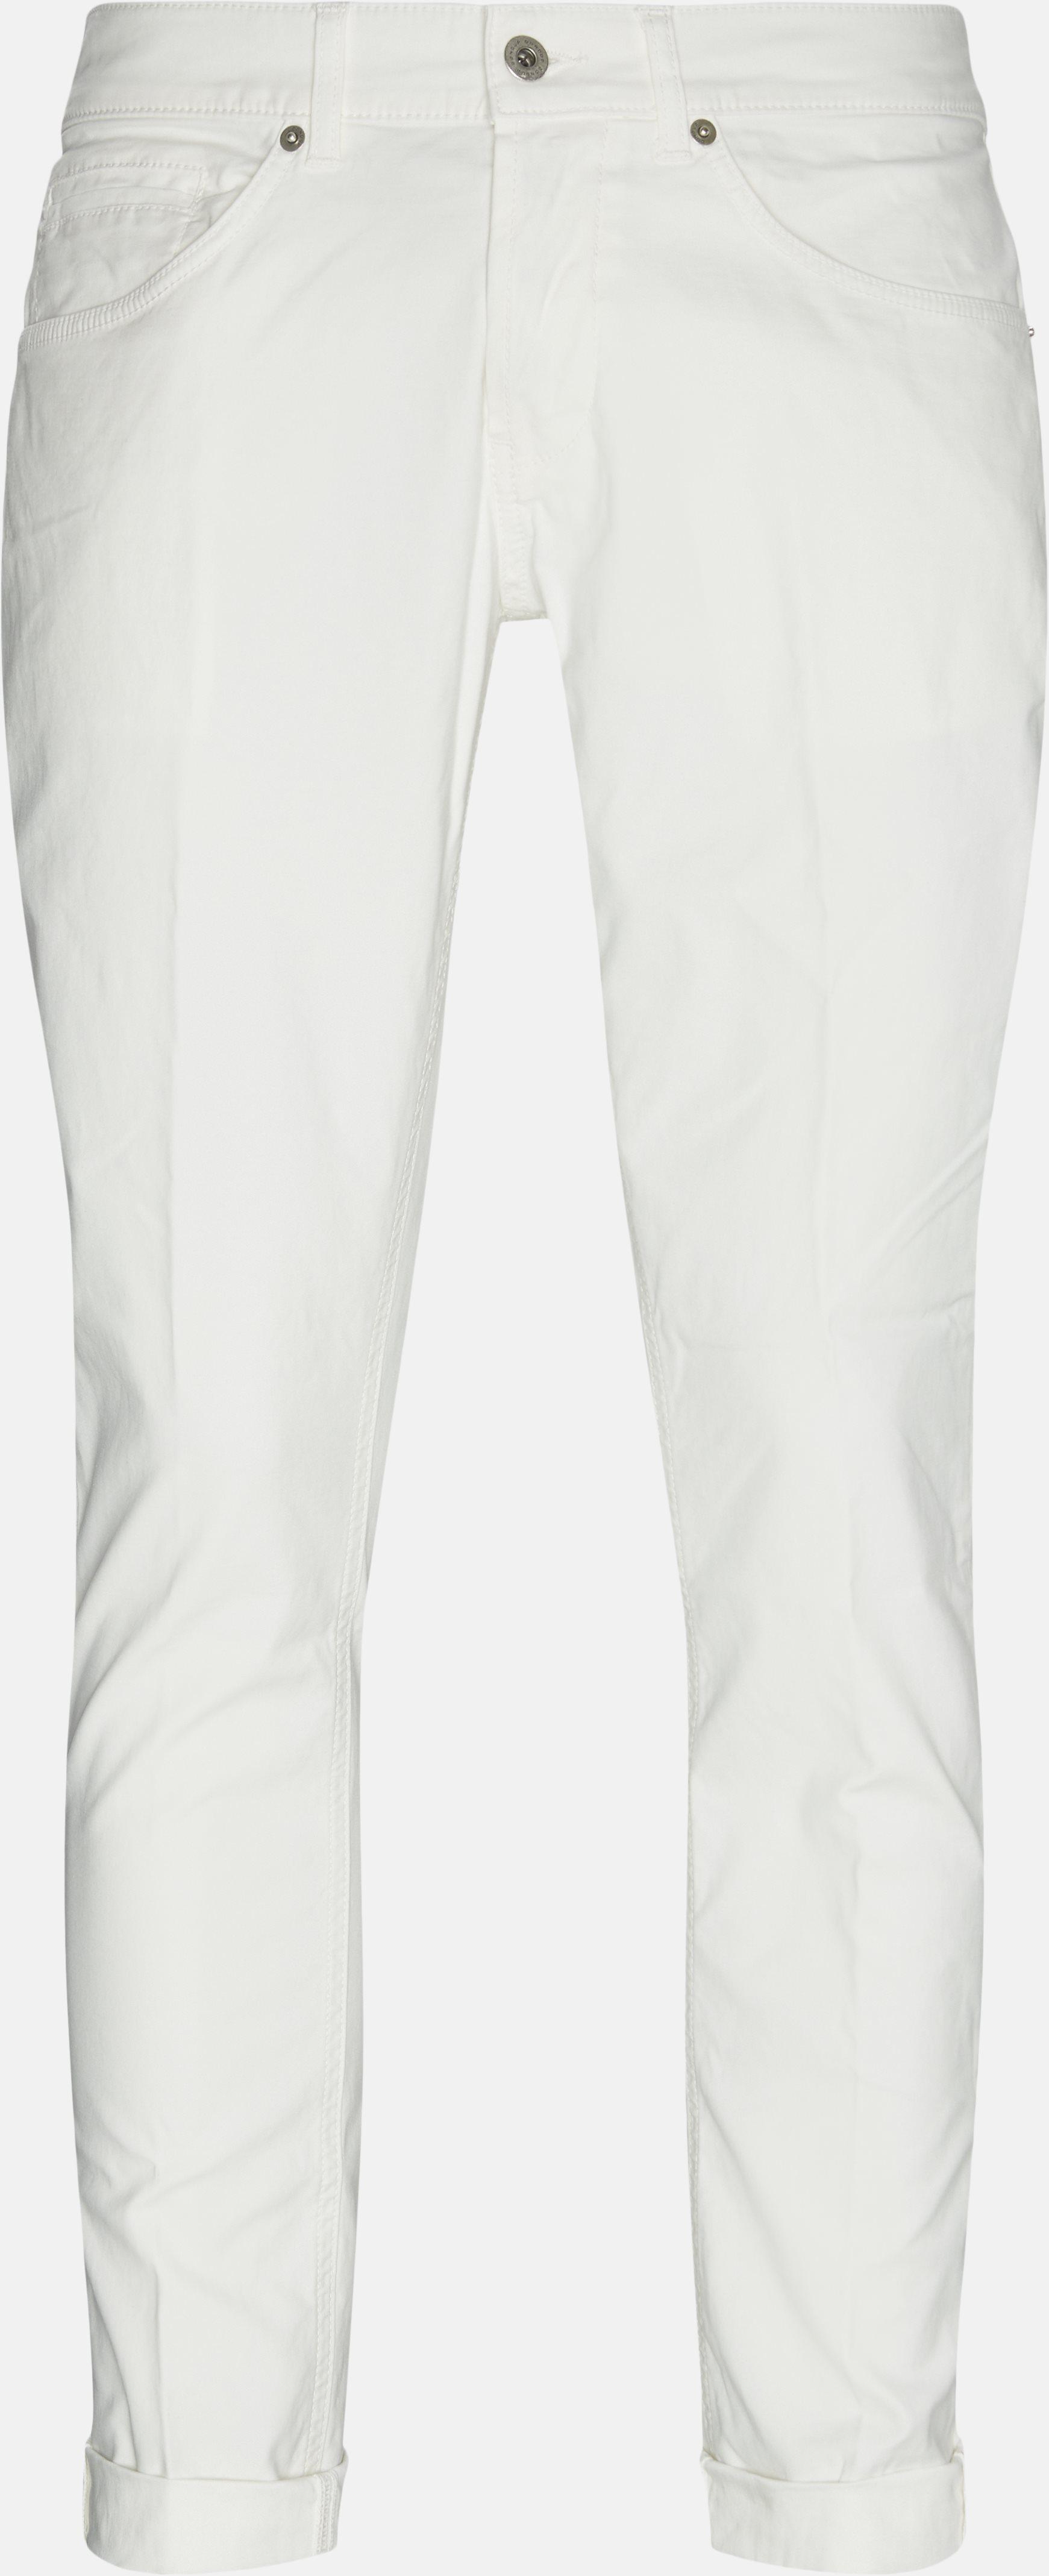 Chinos - Slim - Hvid